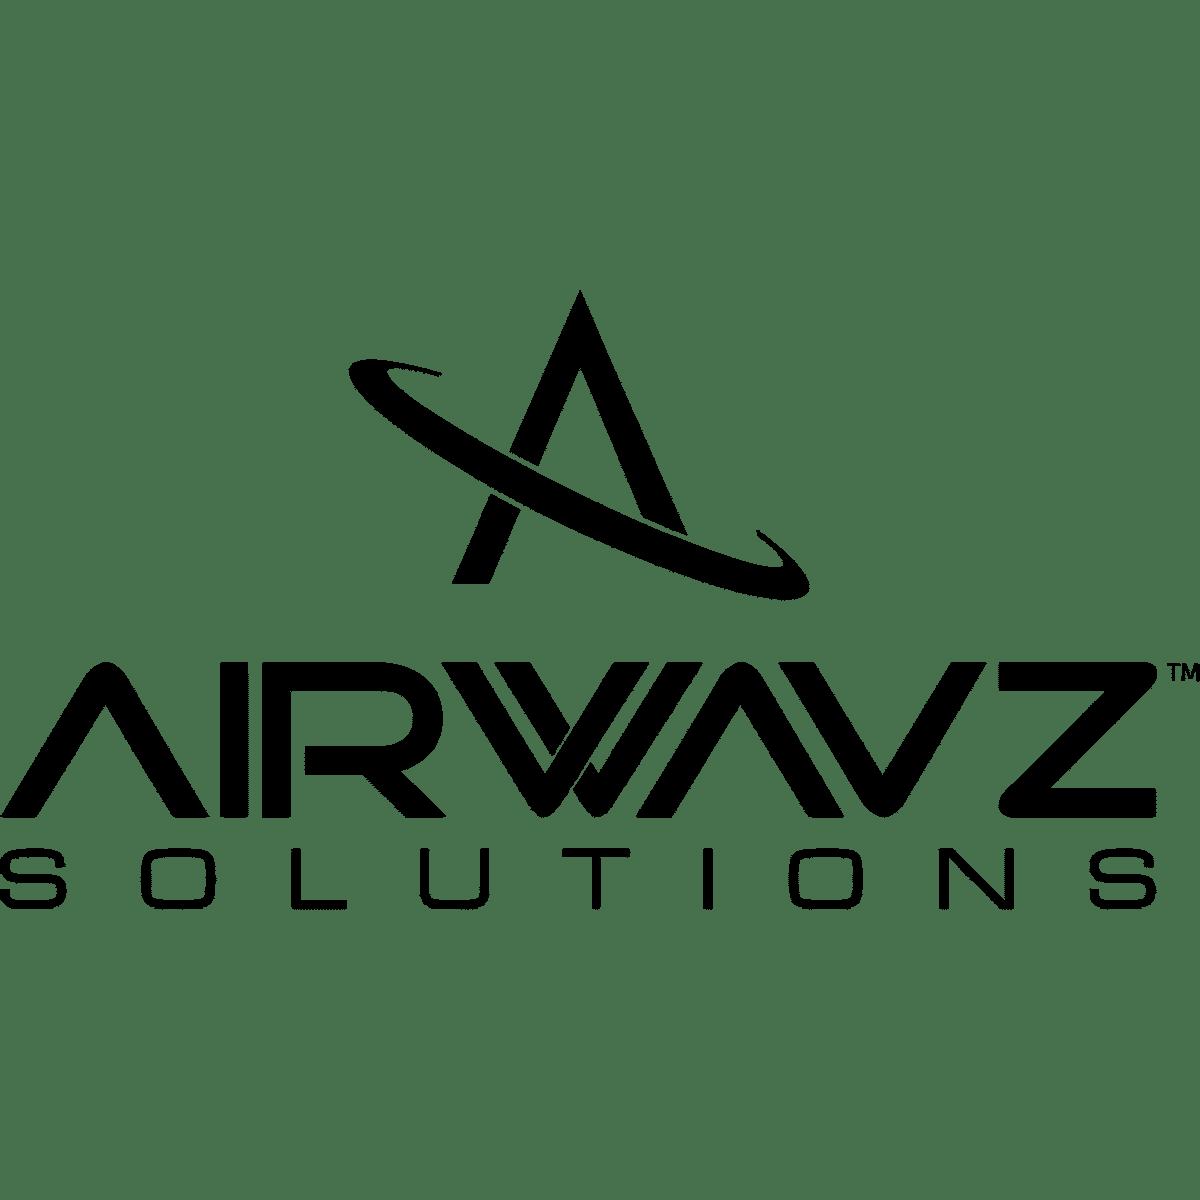 airwavz